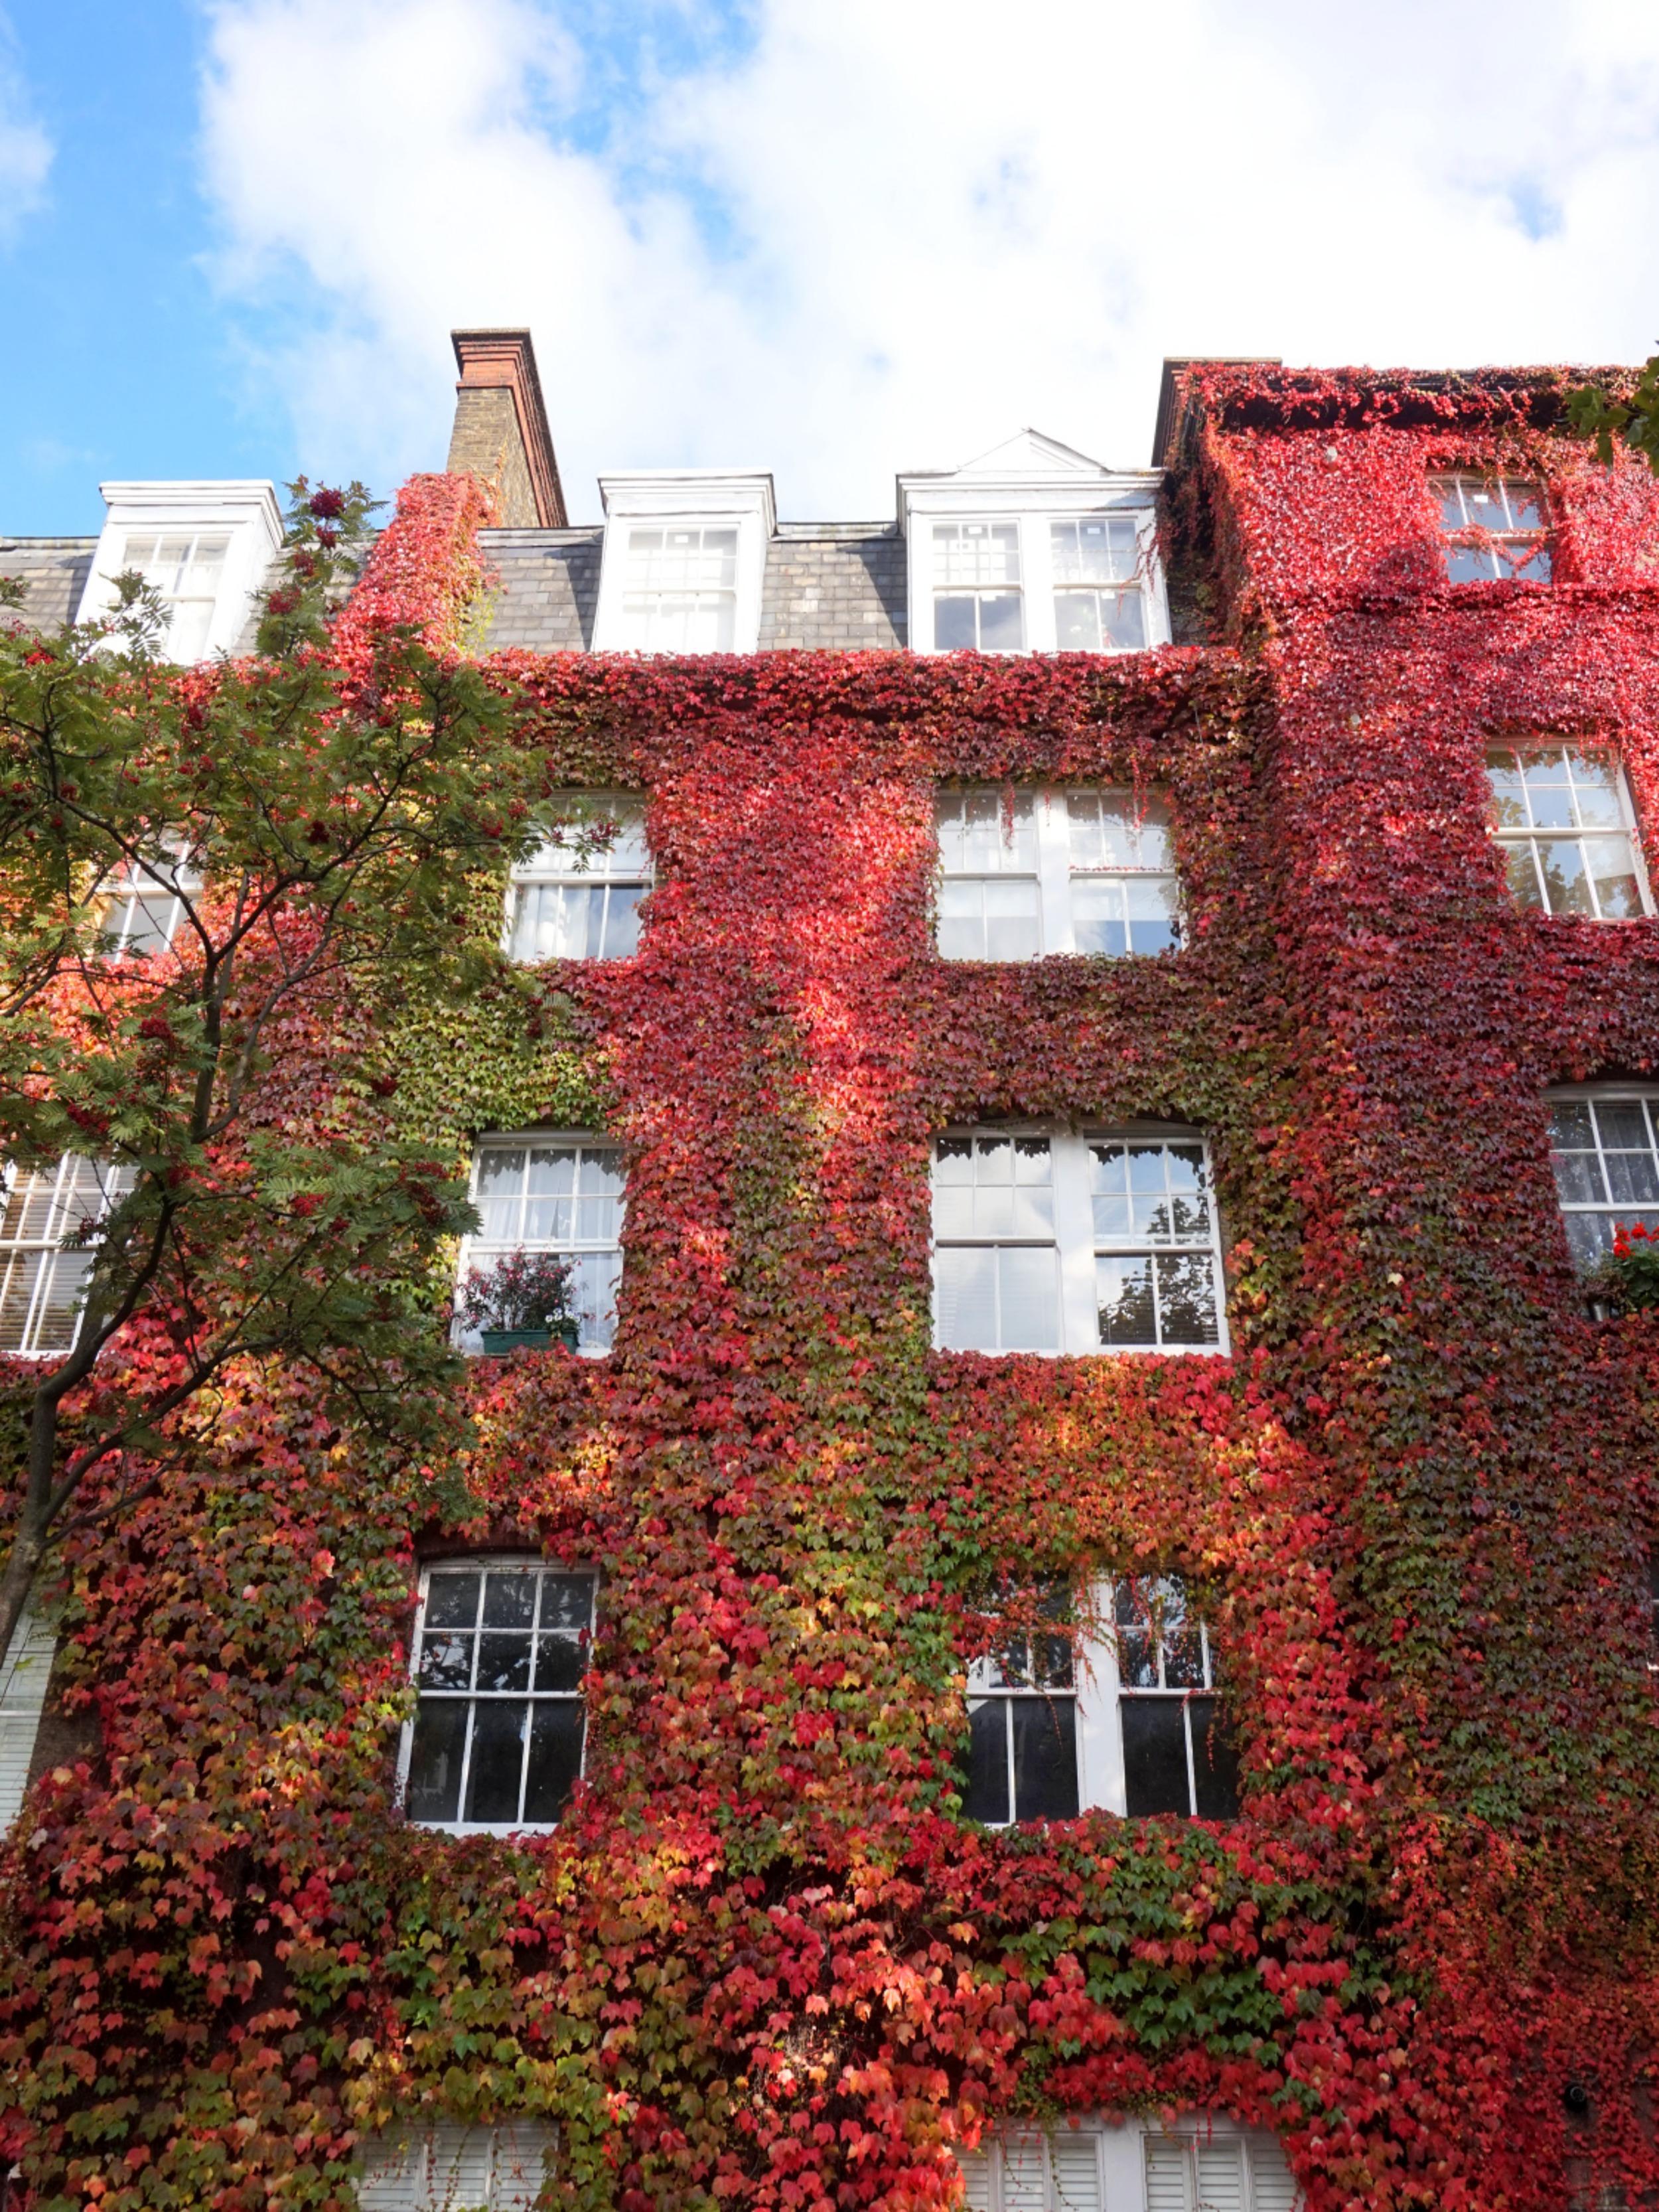 balade-islington-automne-67